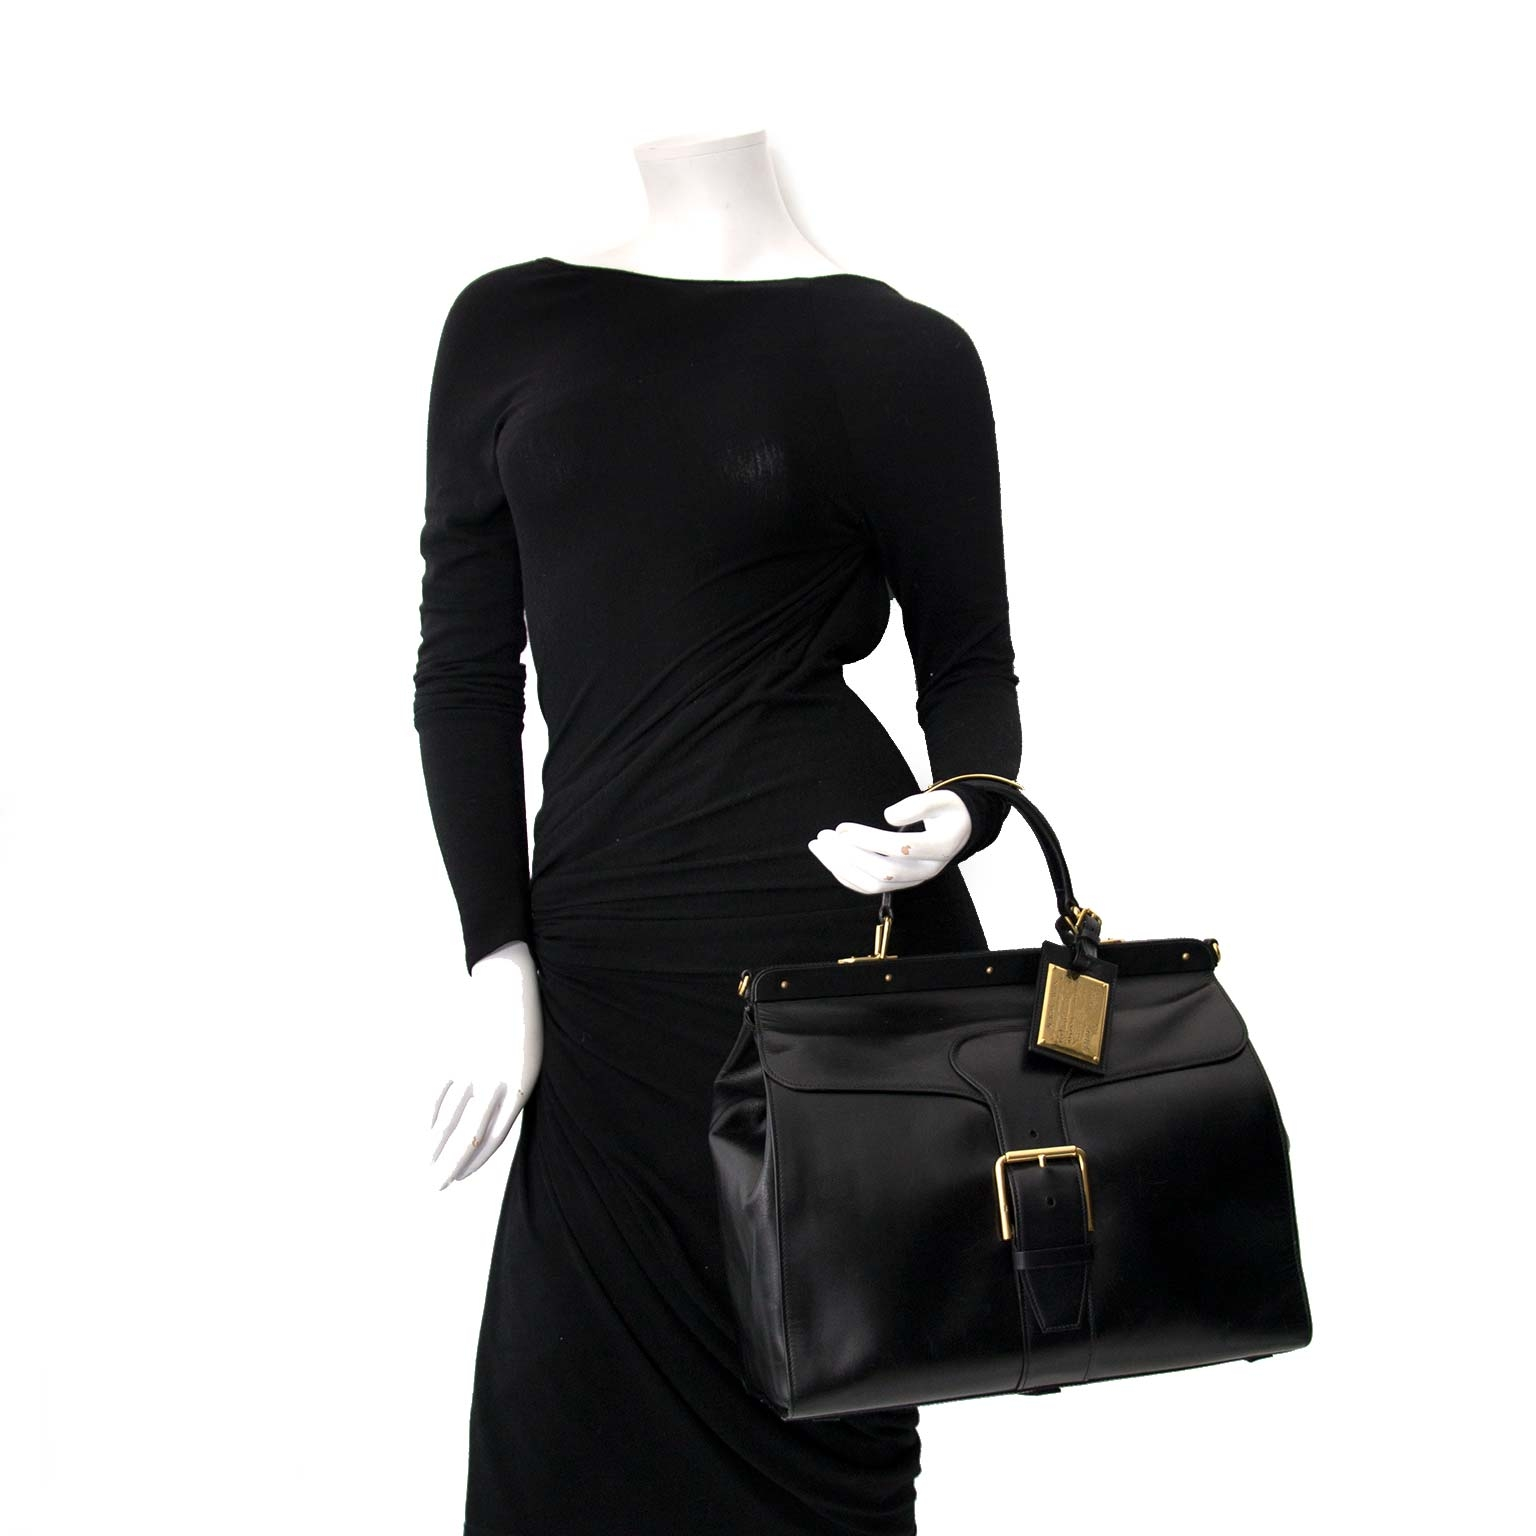 shop safe online secondhand ralph lauren sac malette boxcalf bag